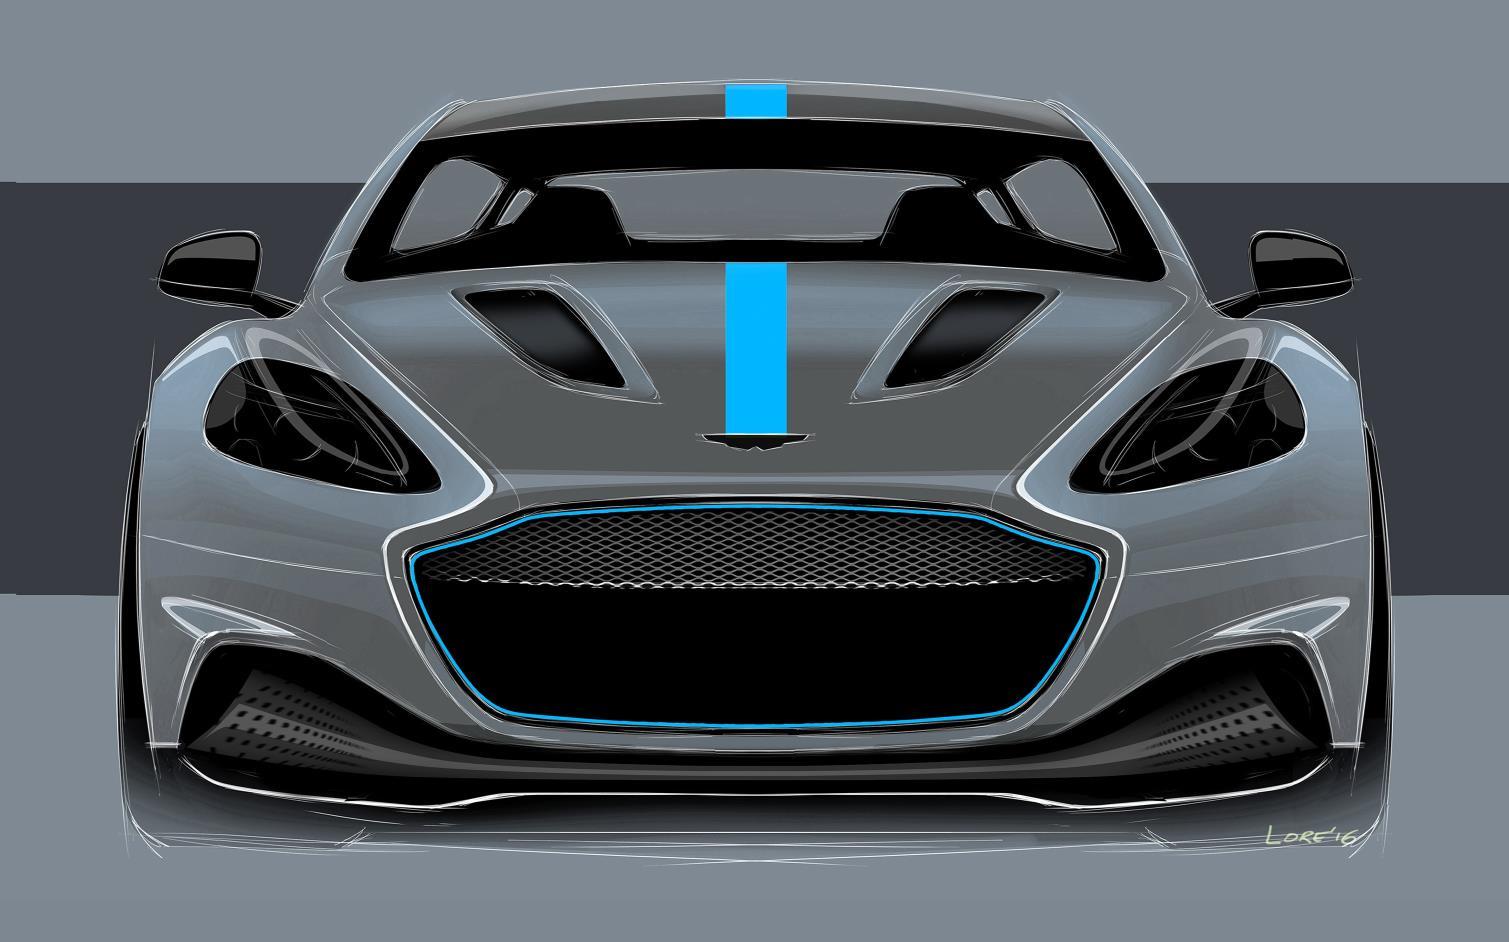 2019 Aston Martin Rapide Design Sketch Namastecar